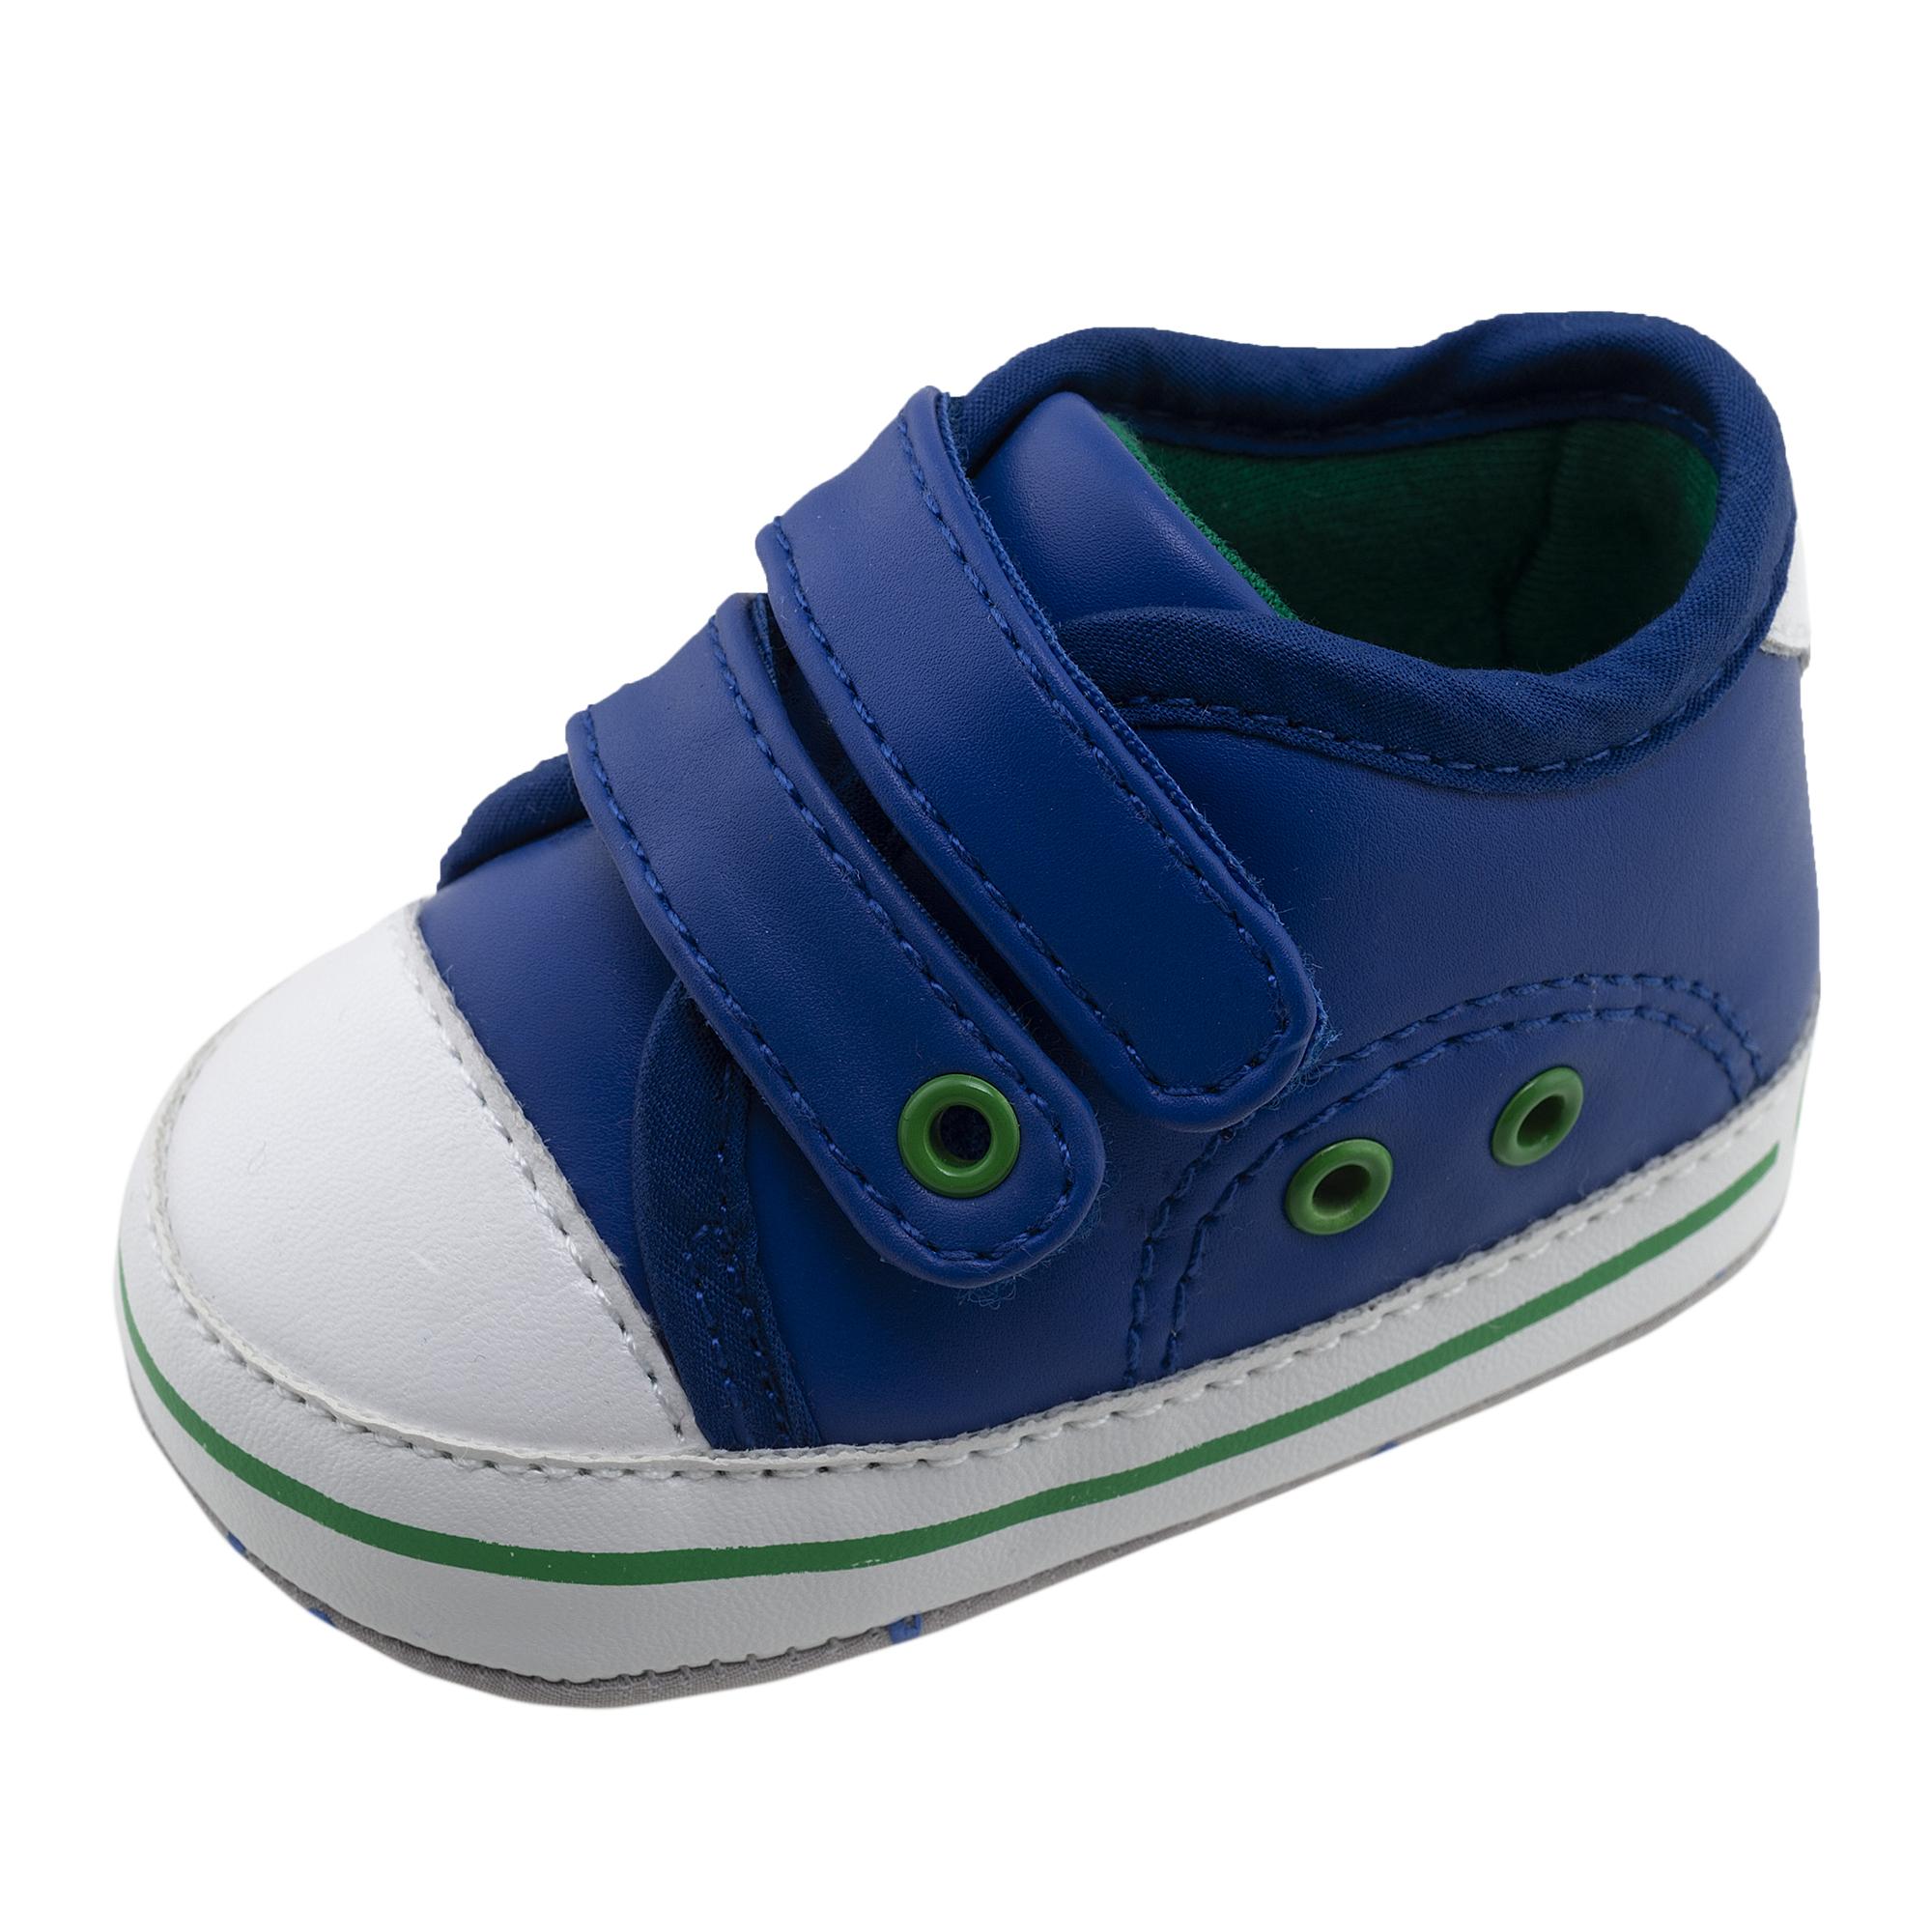 Pantofi Copii Chicco Odeon, Bleumarin, 62137 imagine